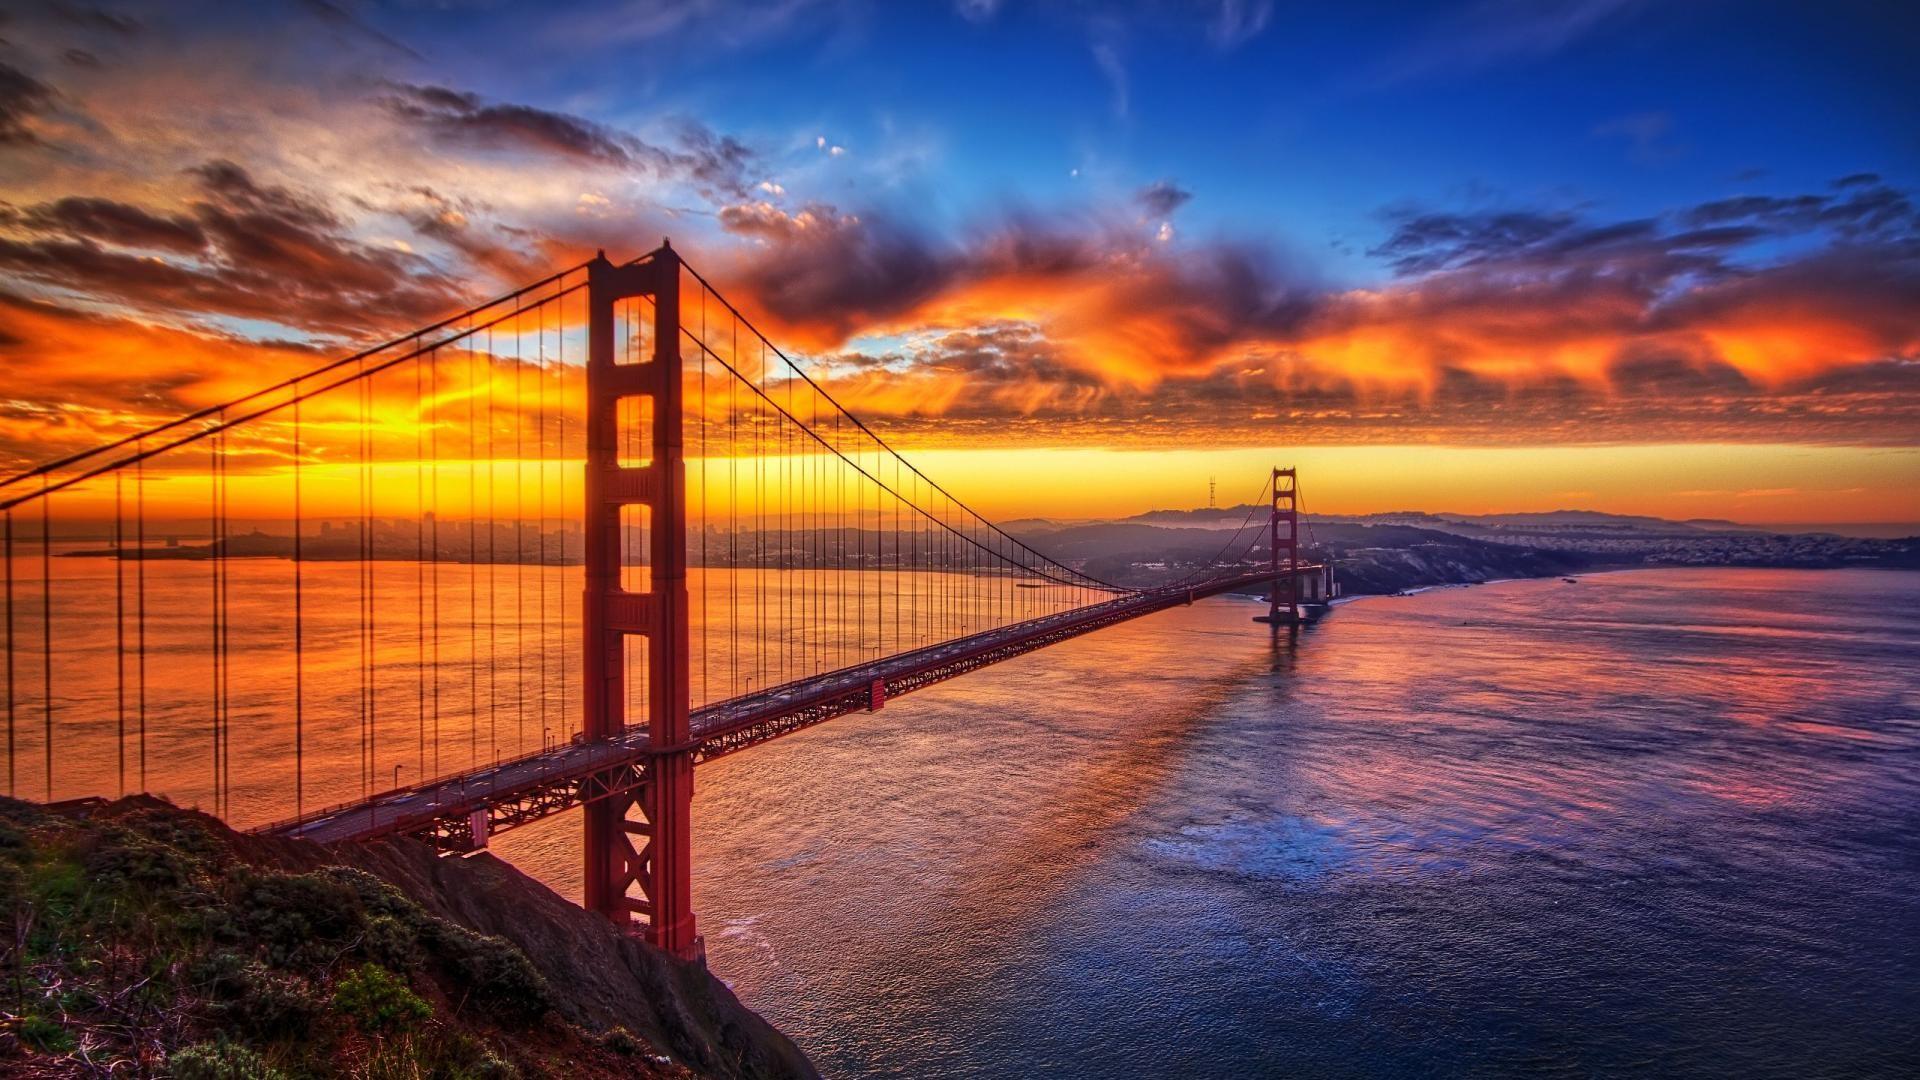 Golden Gate Bridge Wallpaper Wallpapertag